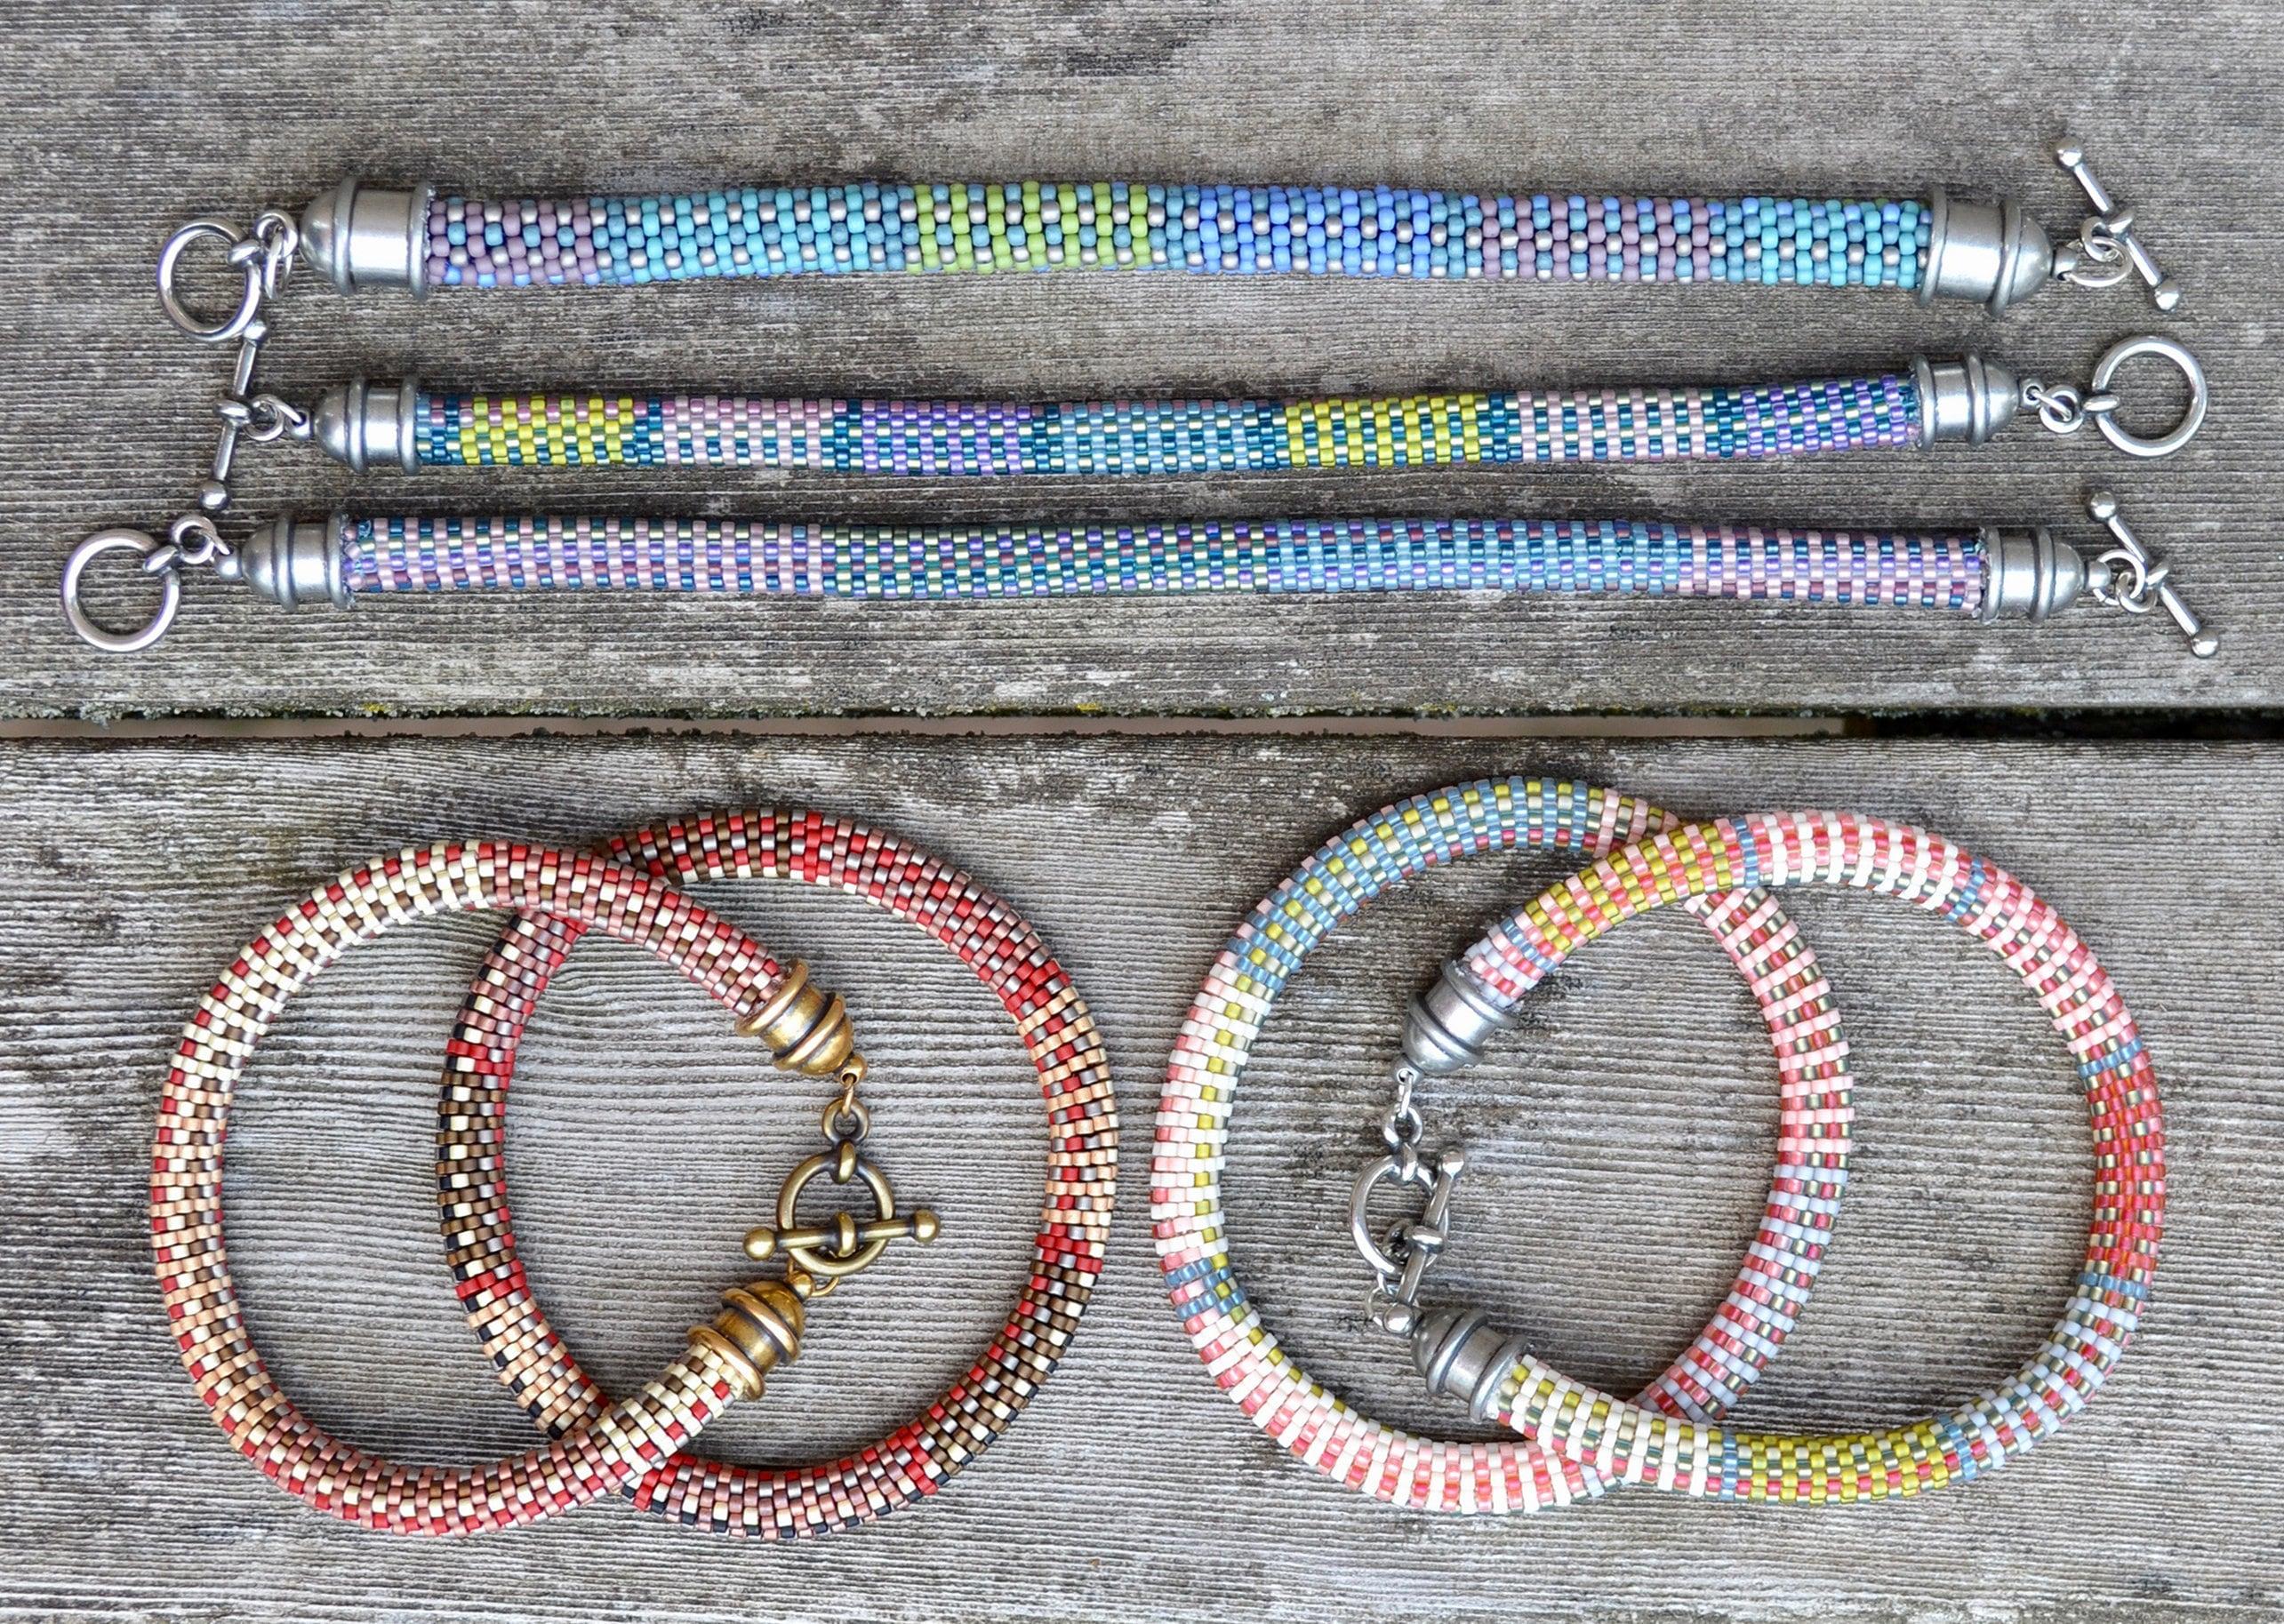 10 Bead Crochet Patterns using Slip Stitch Bead Crochet - Designer ...